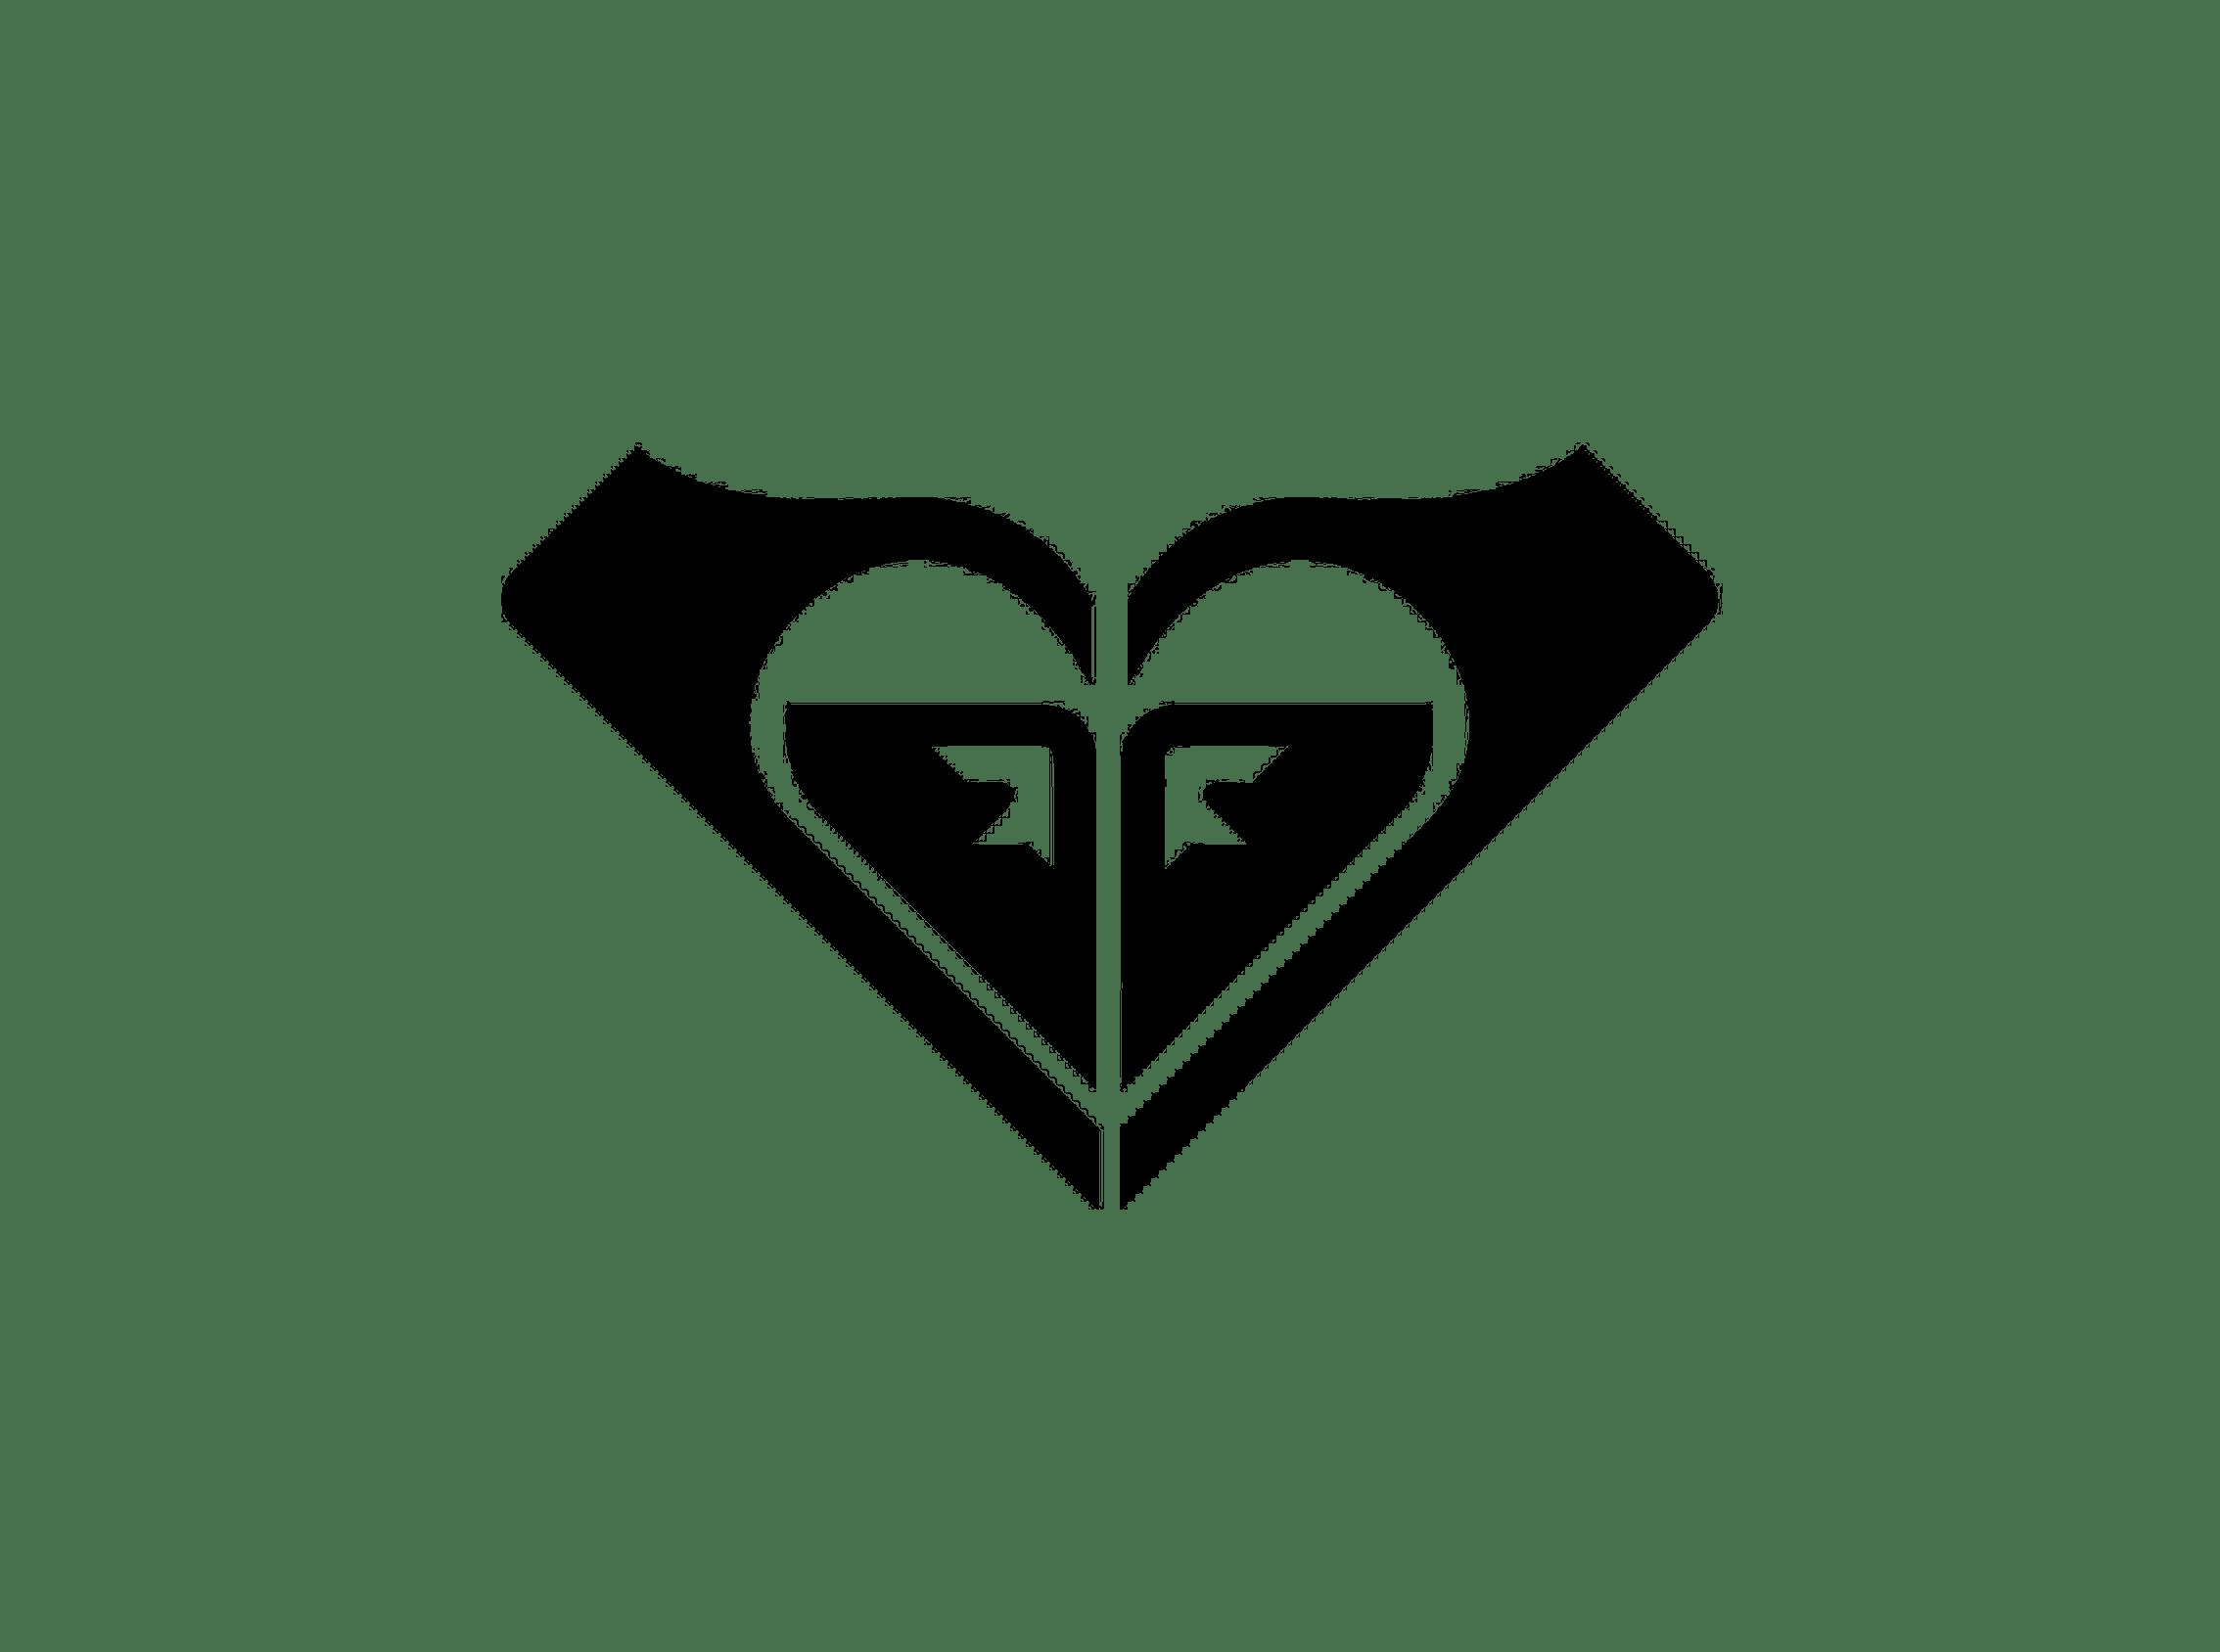 Roxy Logo, Roxy Symbol, Meaning, History and Evolution